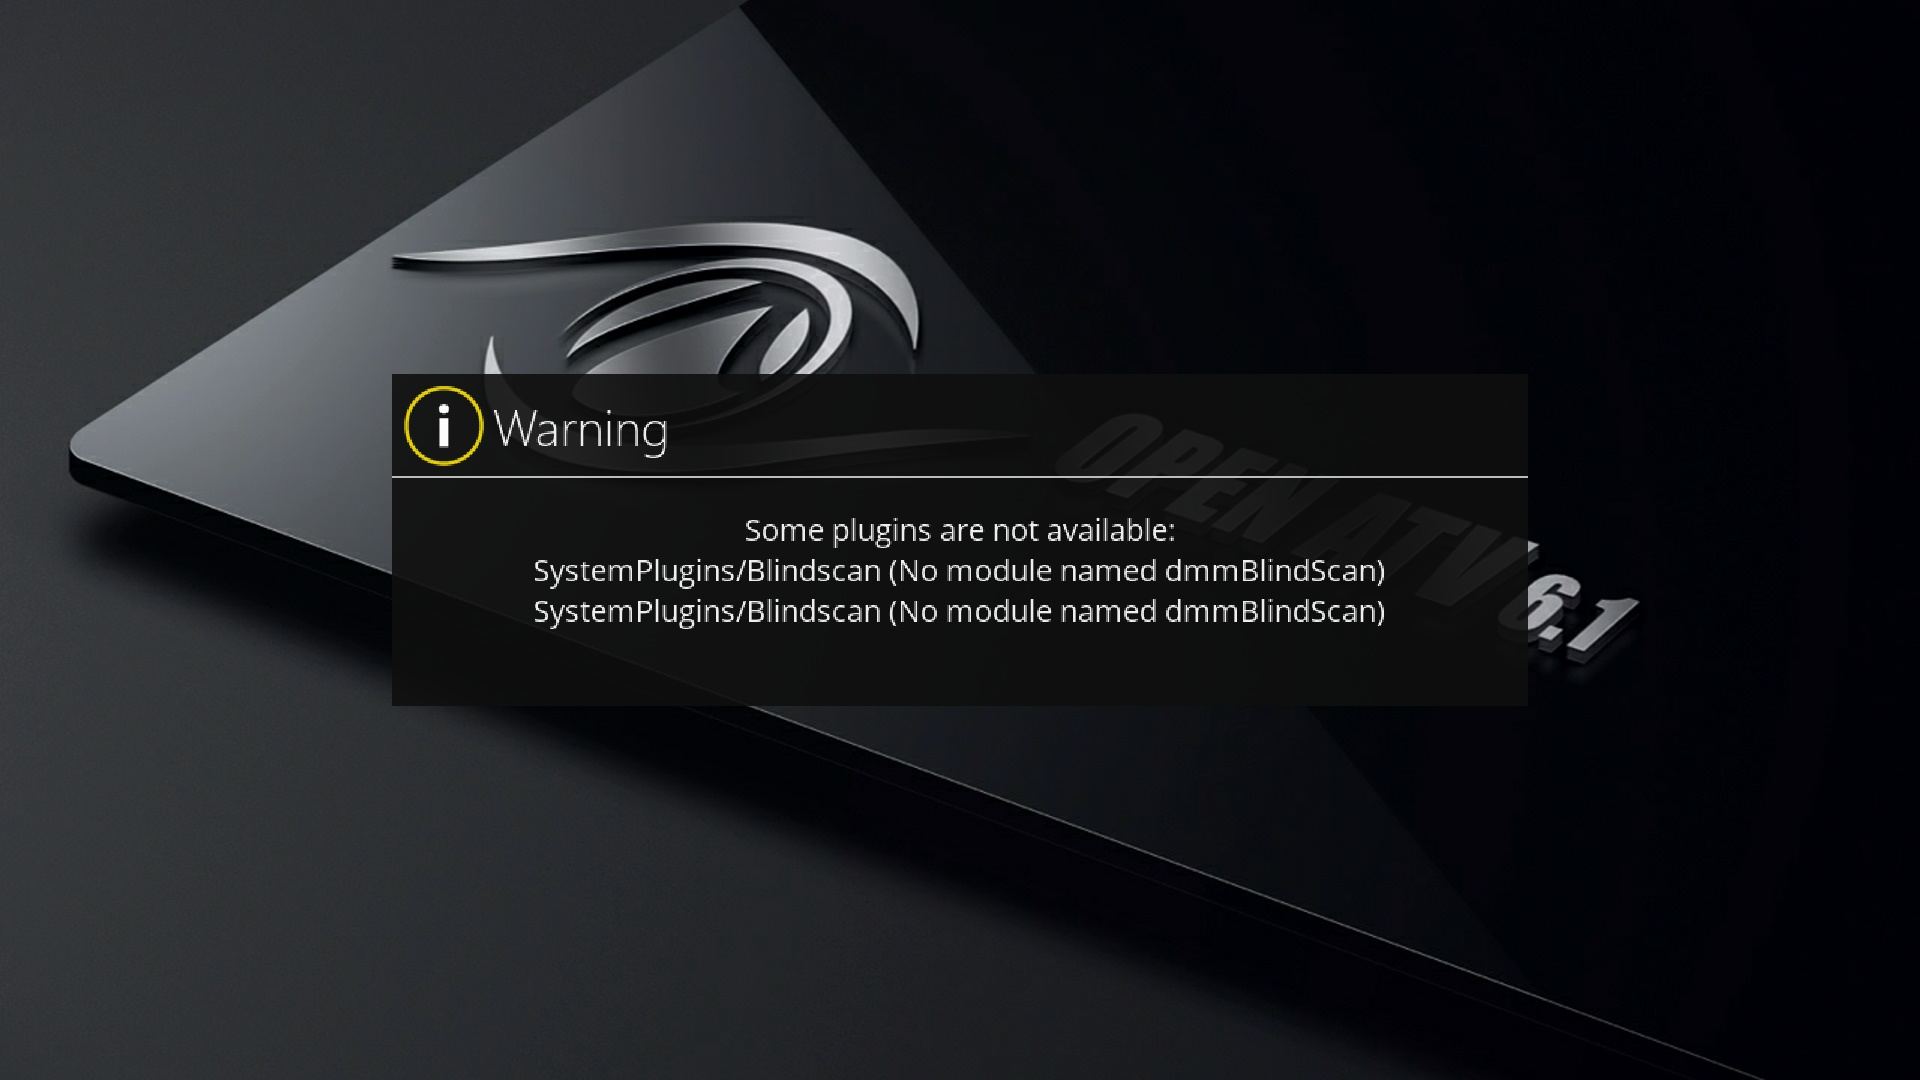 Zgemma H9 Factory Image missing dependant plugins? · Issue